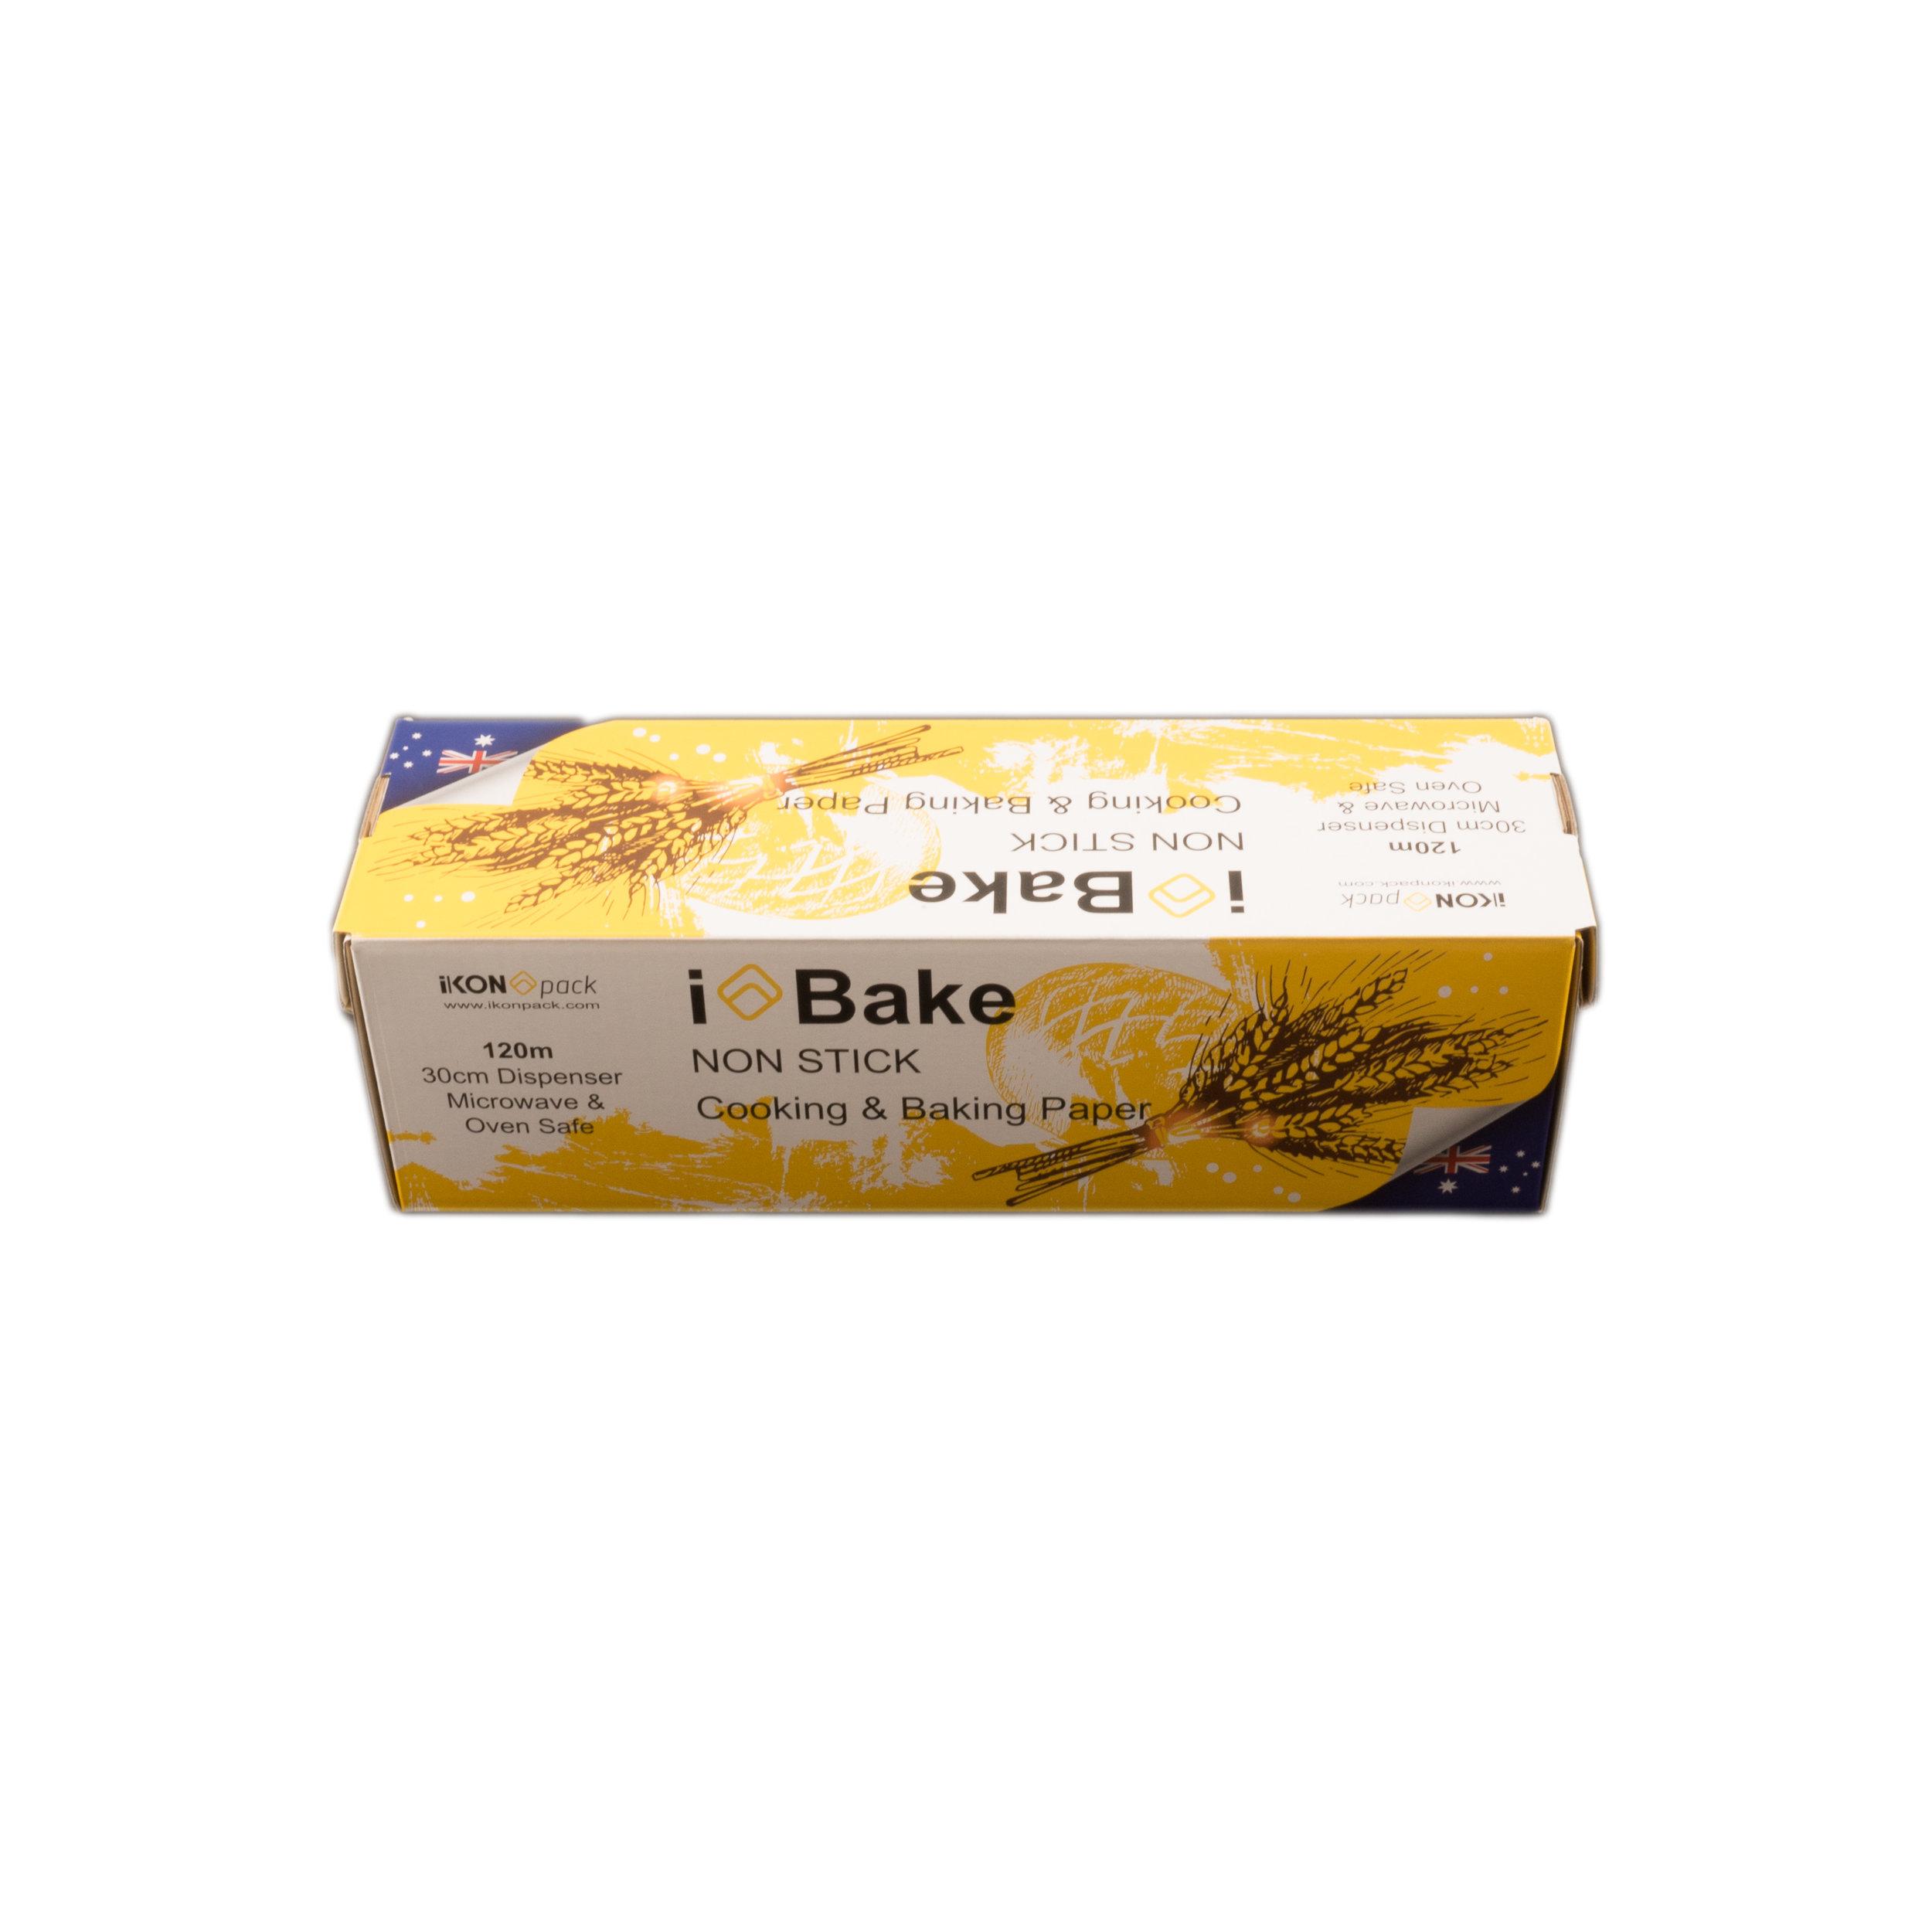 iK-BAKE 30      iBAKE NON STICK - COOKING & BAKING PAPER    30cm x 120m Roll 4 rolls per carton